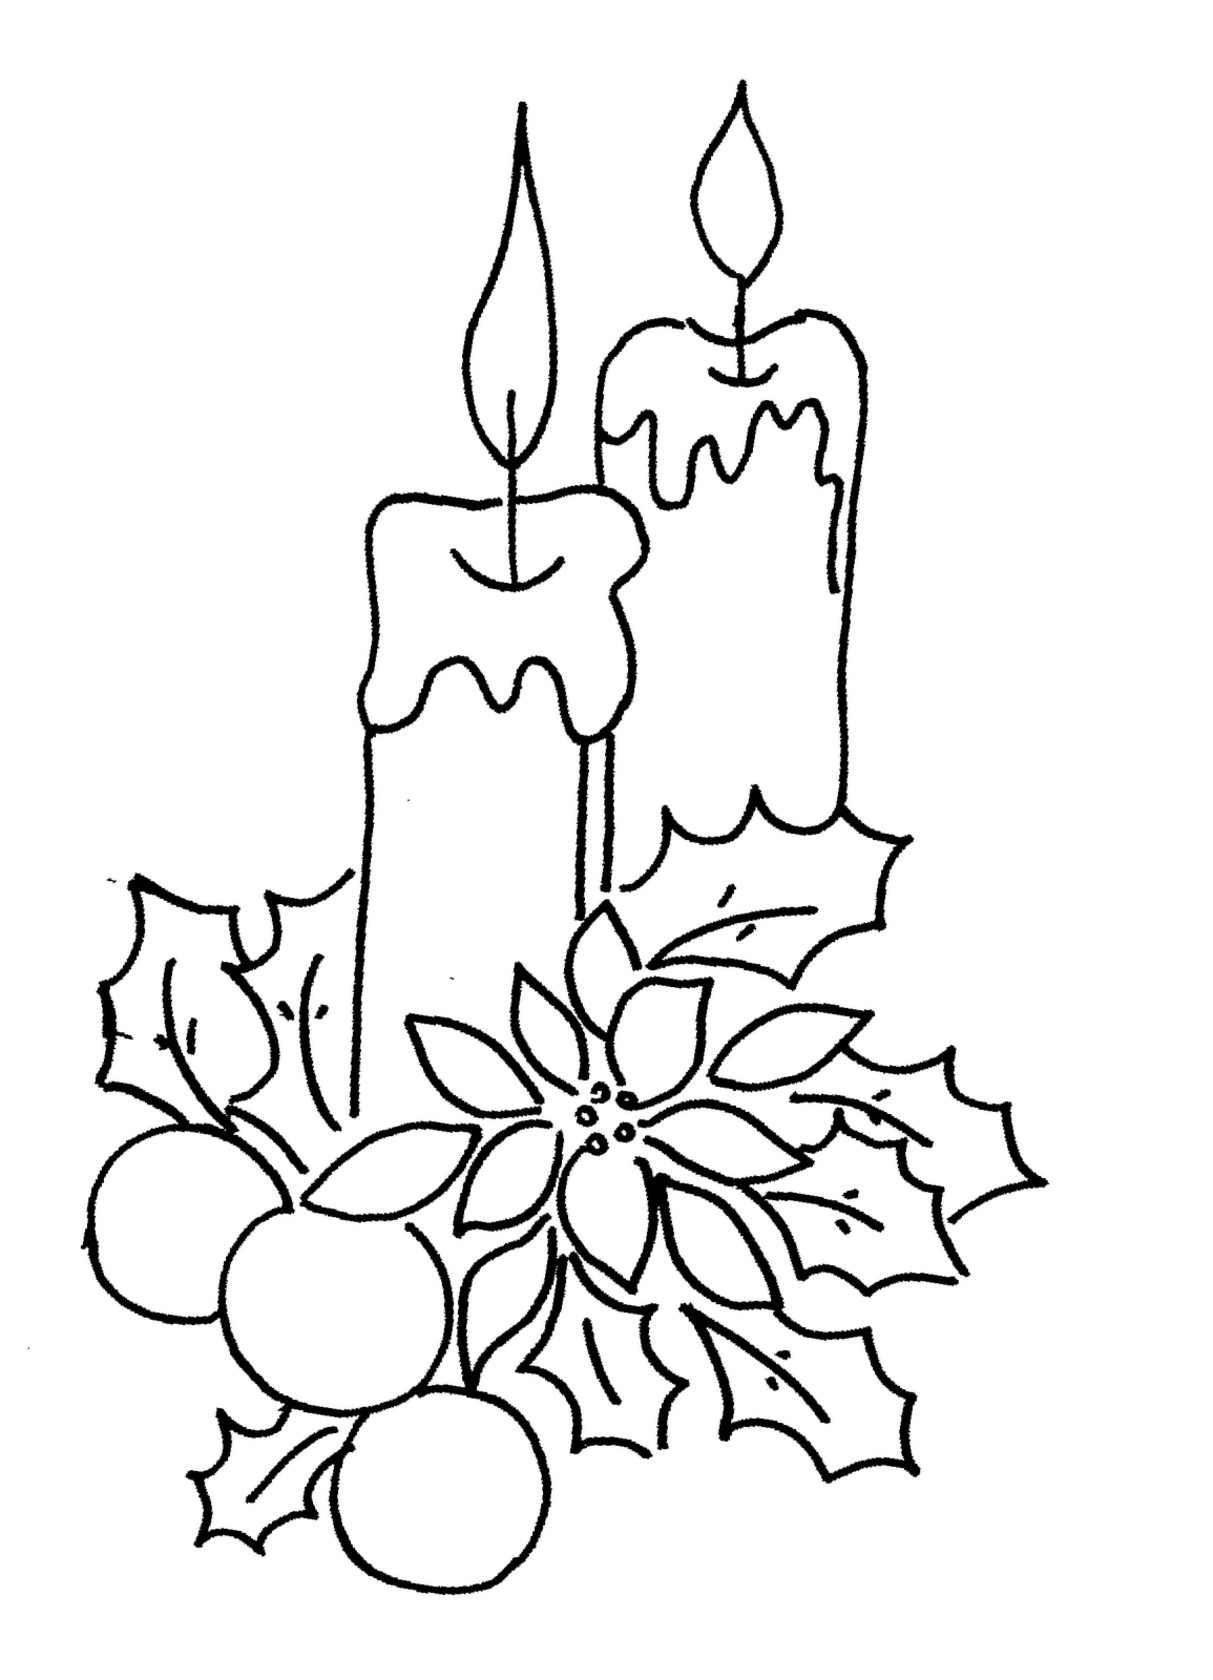 Christmas candle pattern | marta hdez | Pinterest | Patterns ...